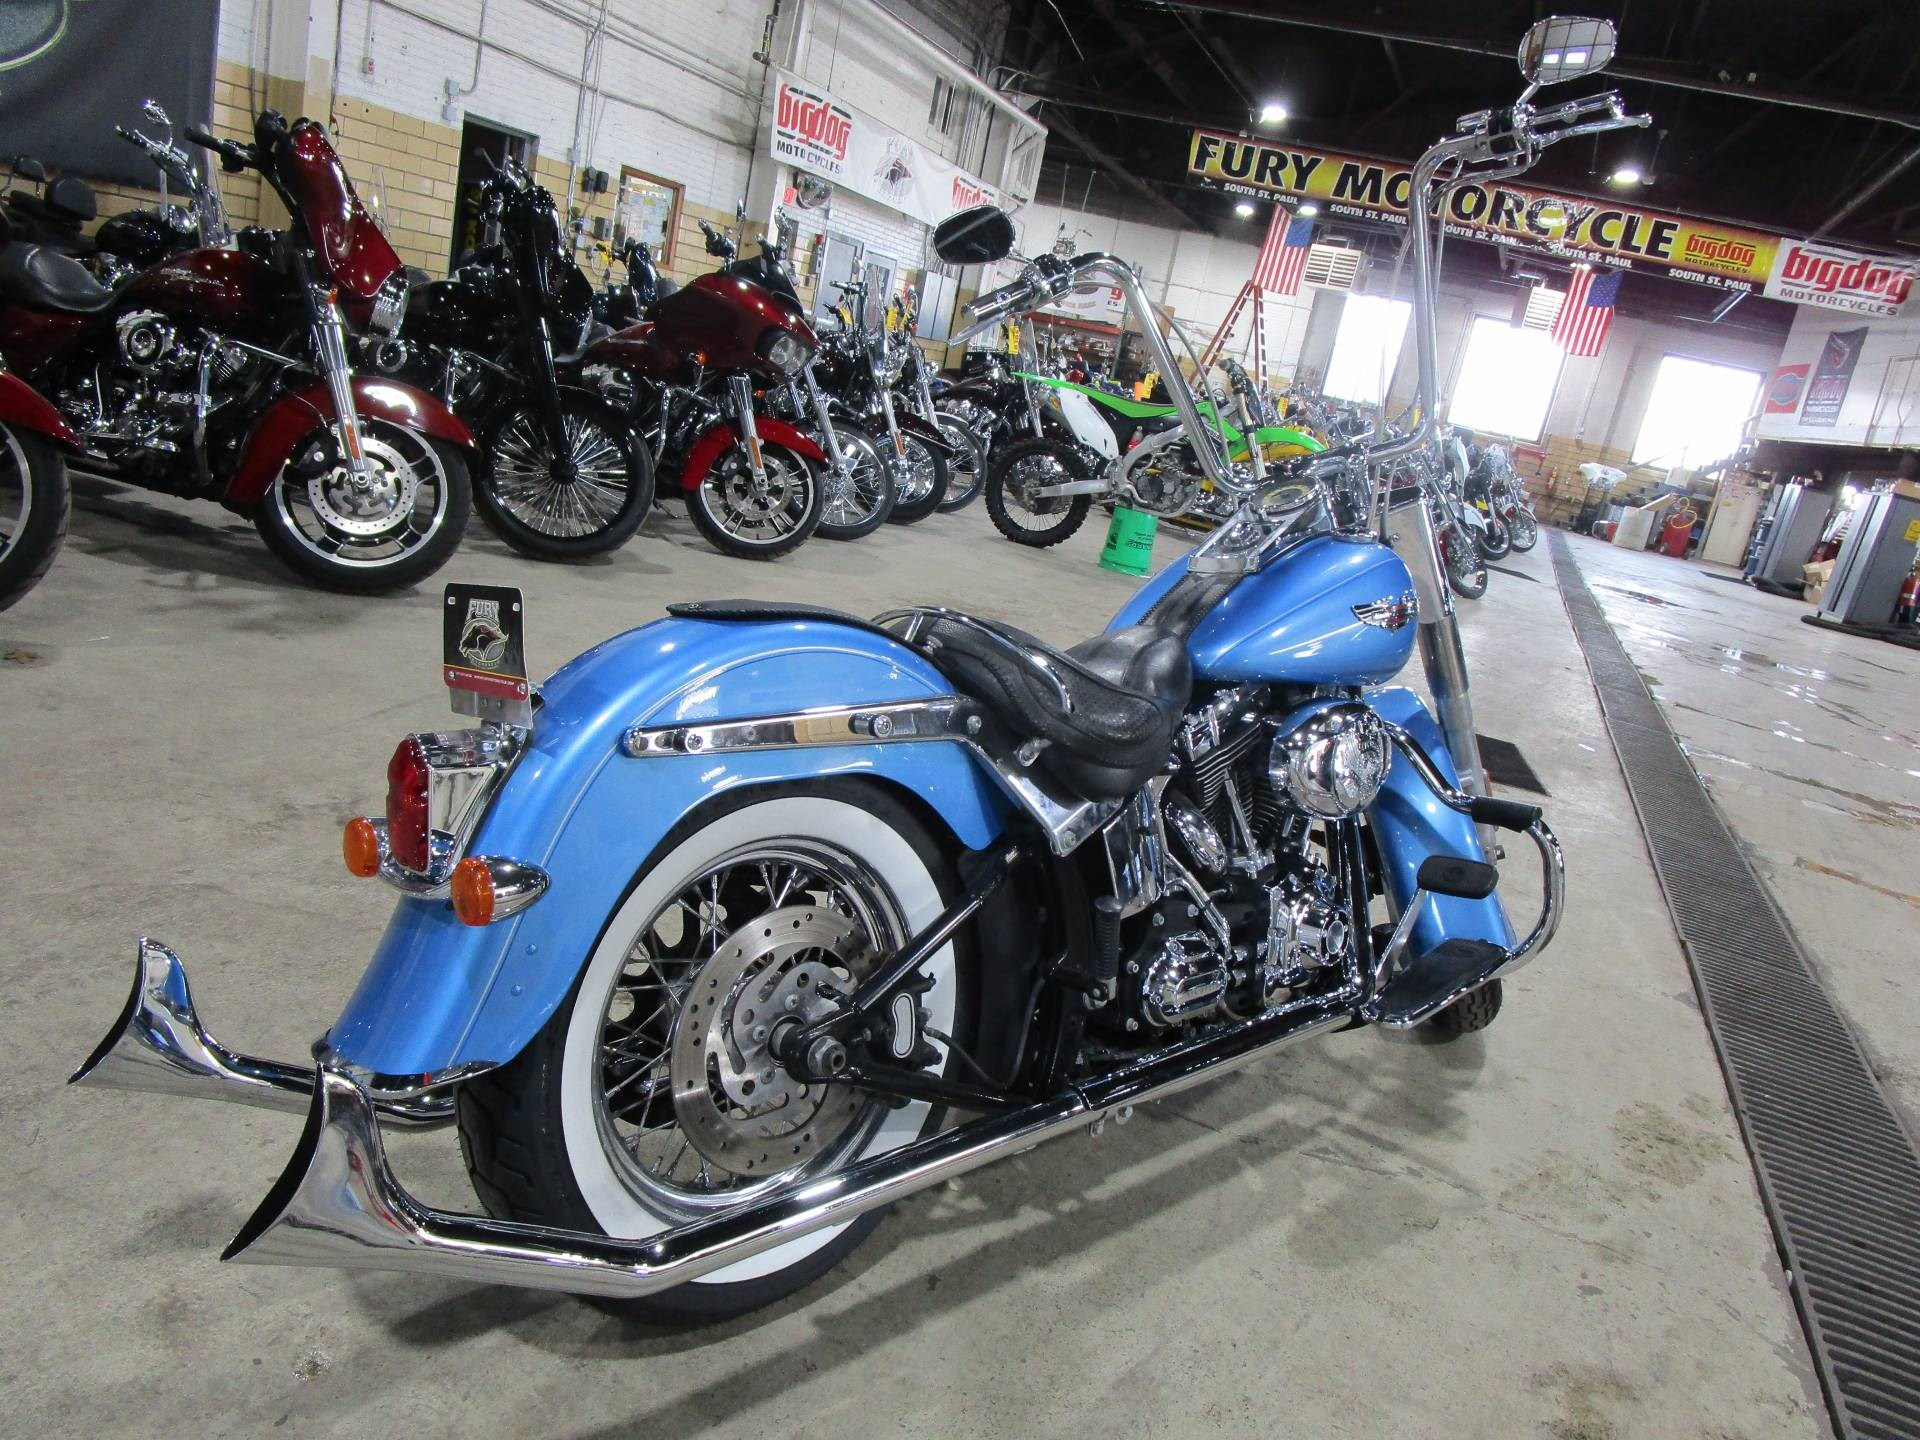 Fury Motors South St Paul >> 2011 Harley Davidson Flstn Softail Deluxe